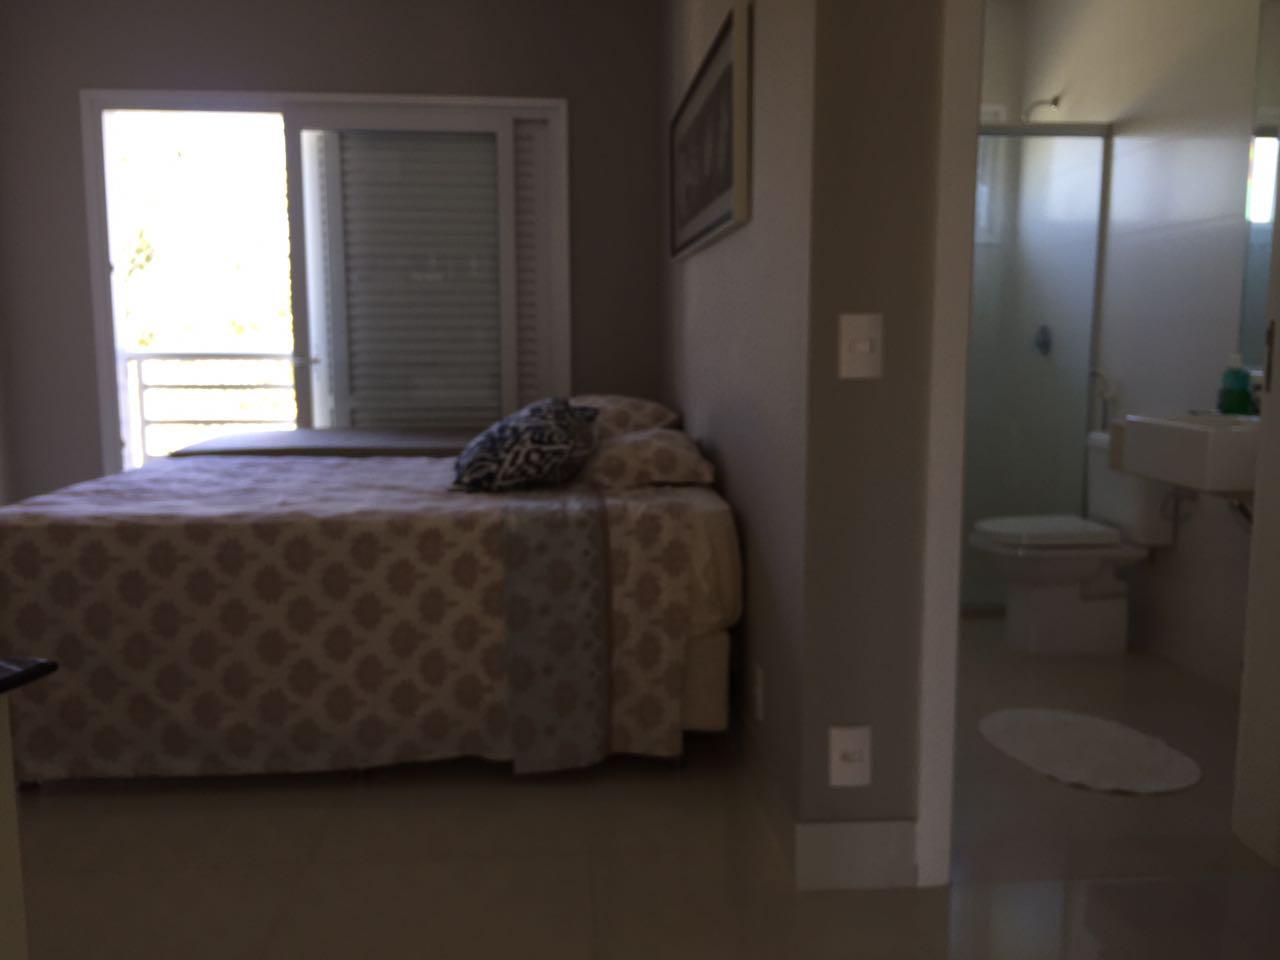 Casa Cond. Fechado  com 4 quartos sendo 4 Suítes no FLORAIS CUIABA, Cuiabá  - MT